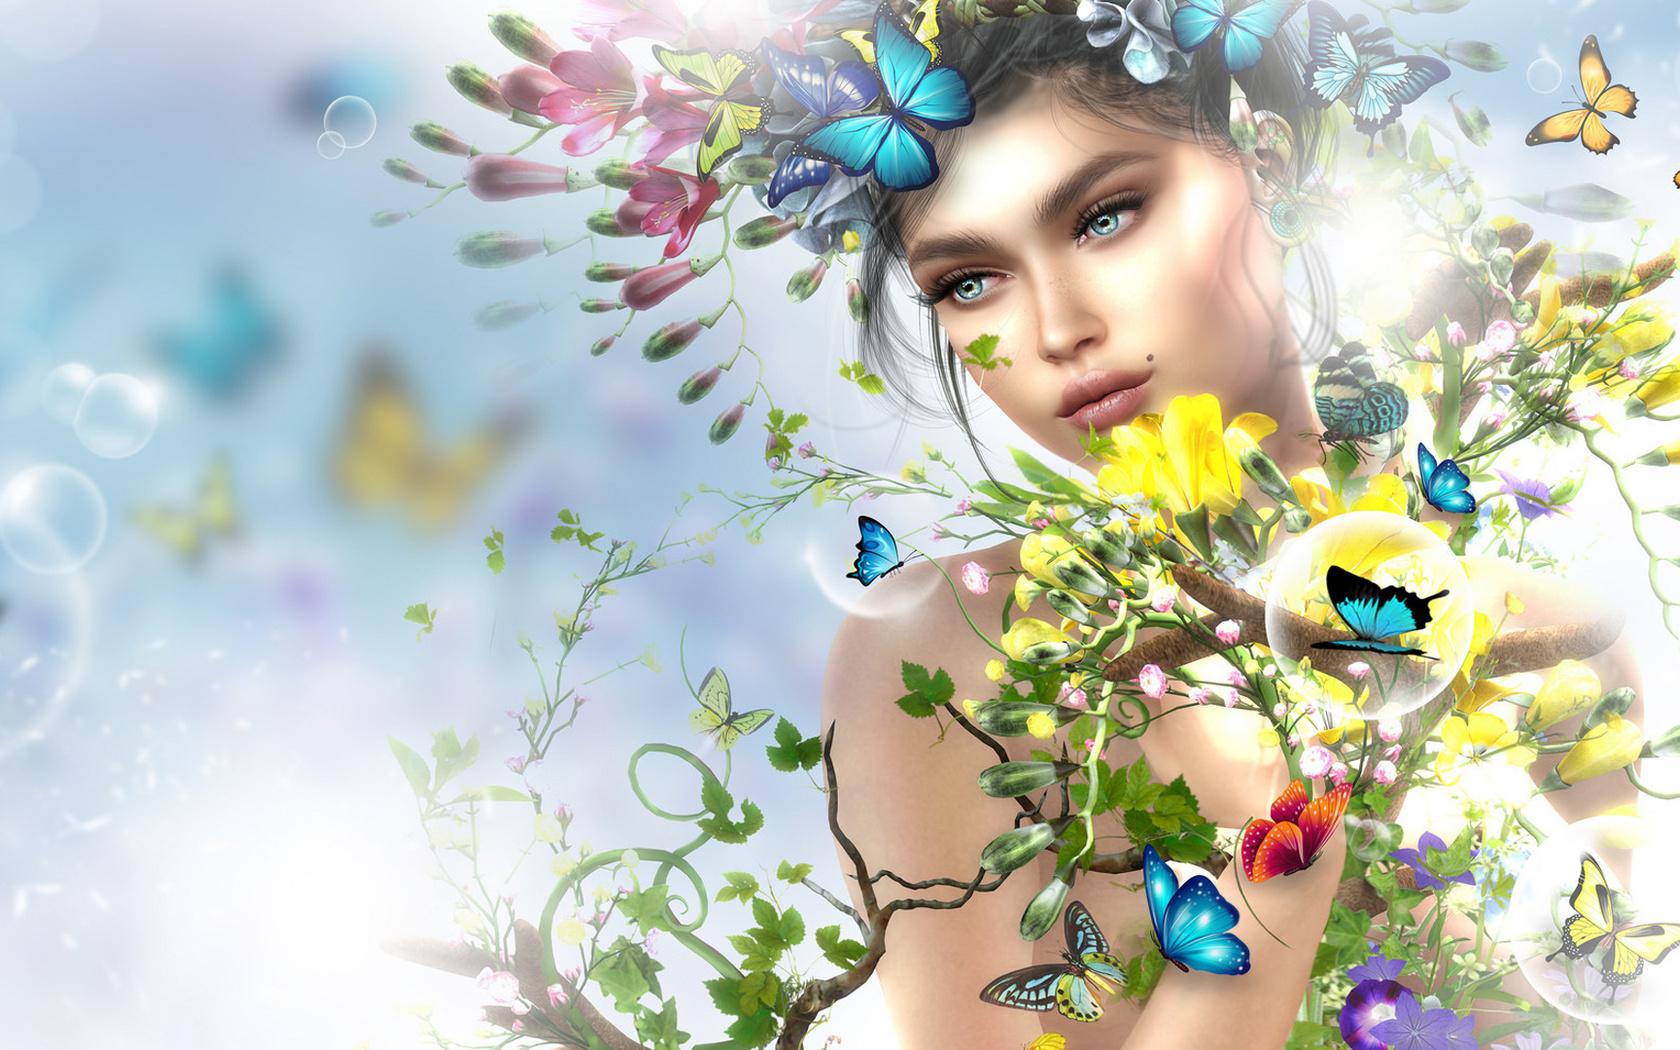 Картинки девушки цветы бабочки, христа спасителя